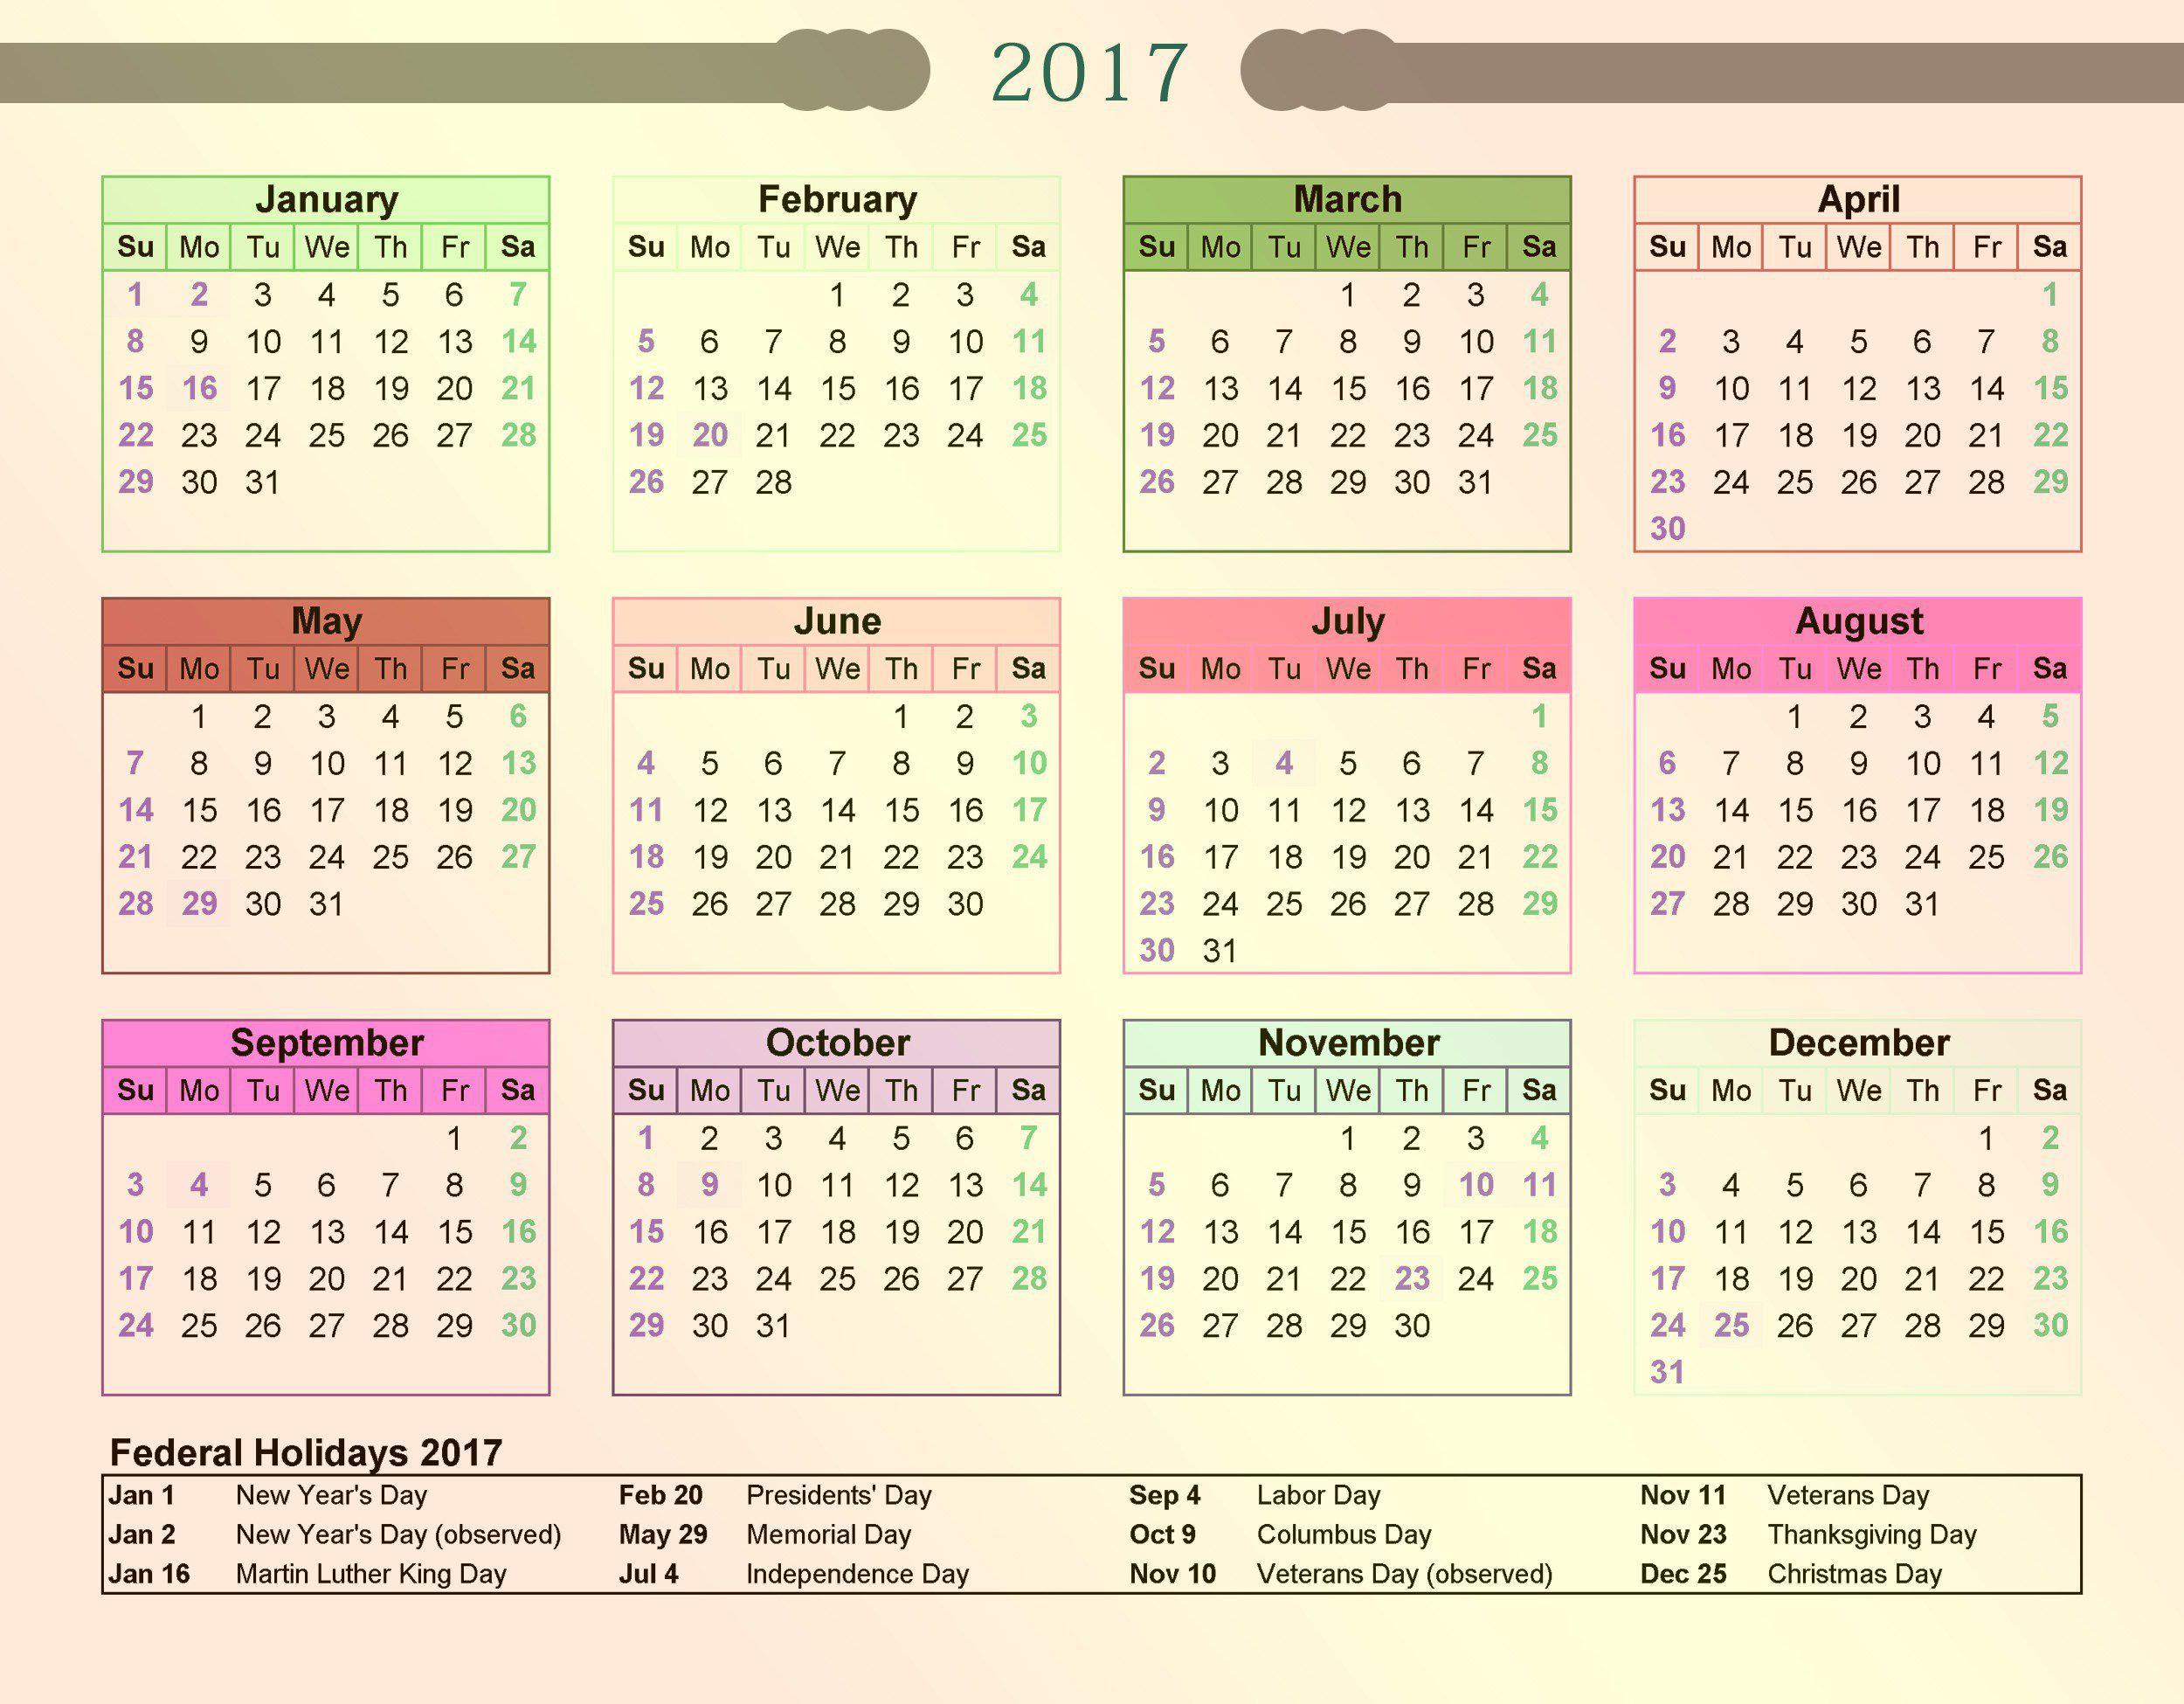 009 Sensational Google Calendar Template 2017 Picture Full